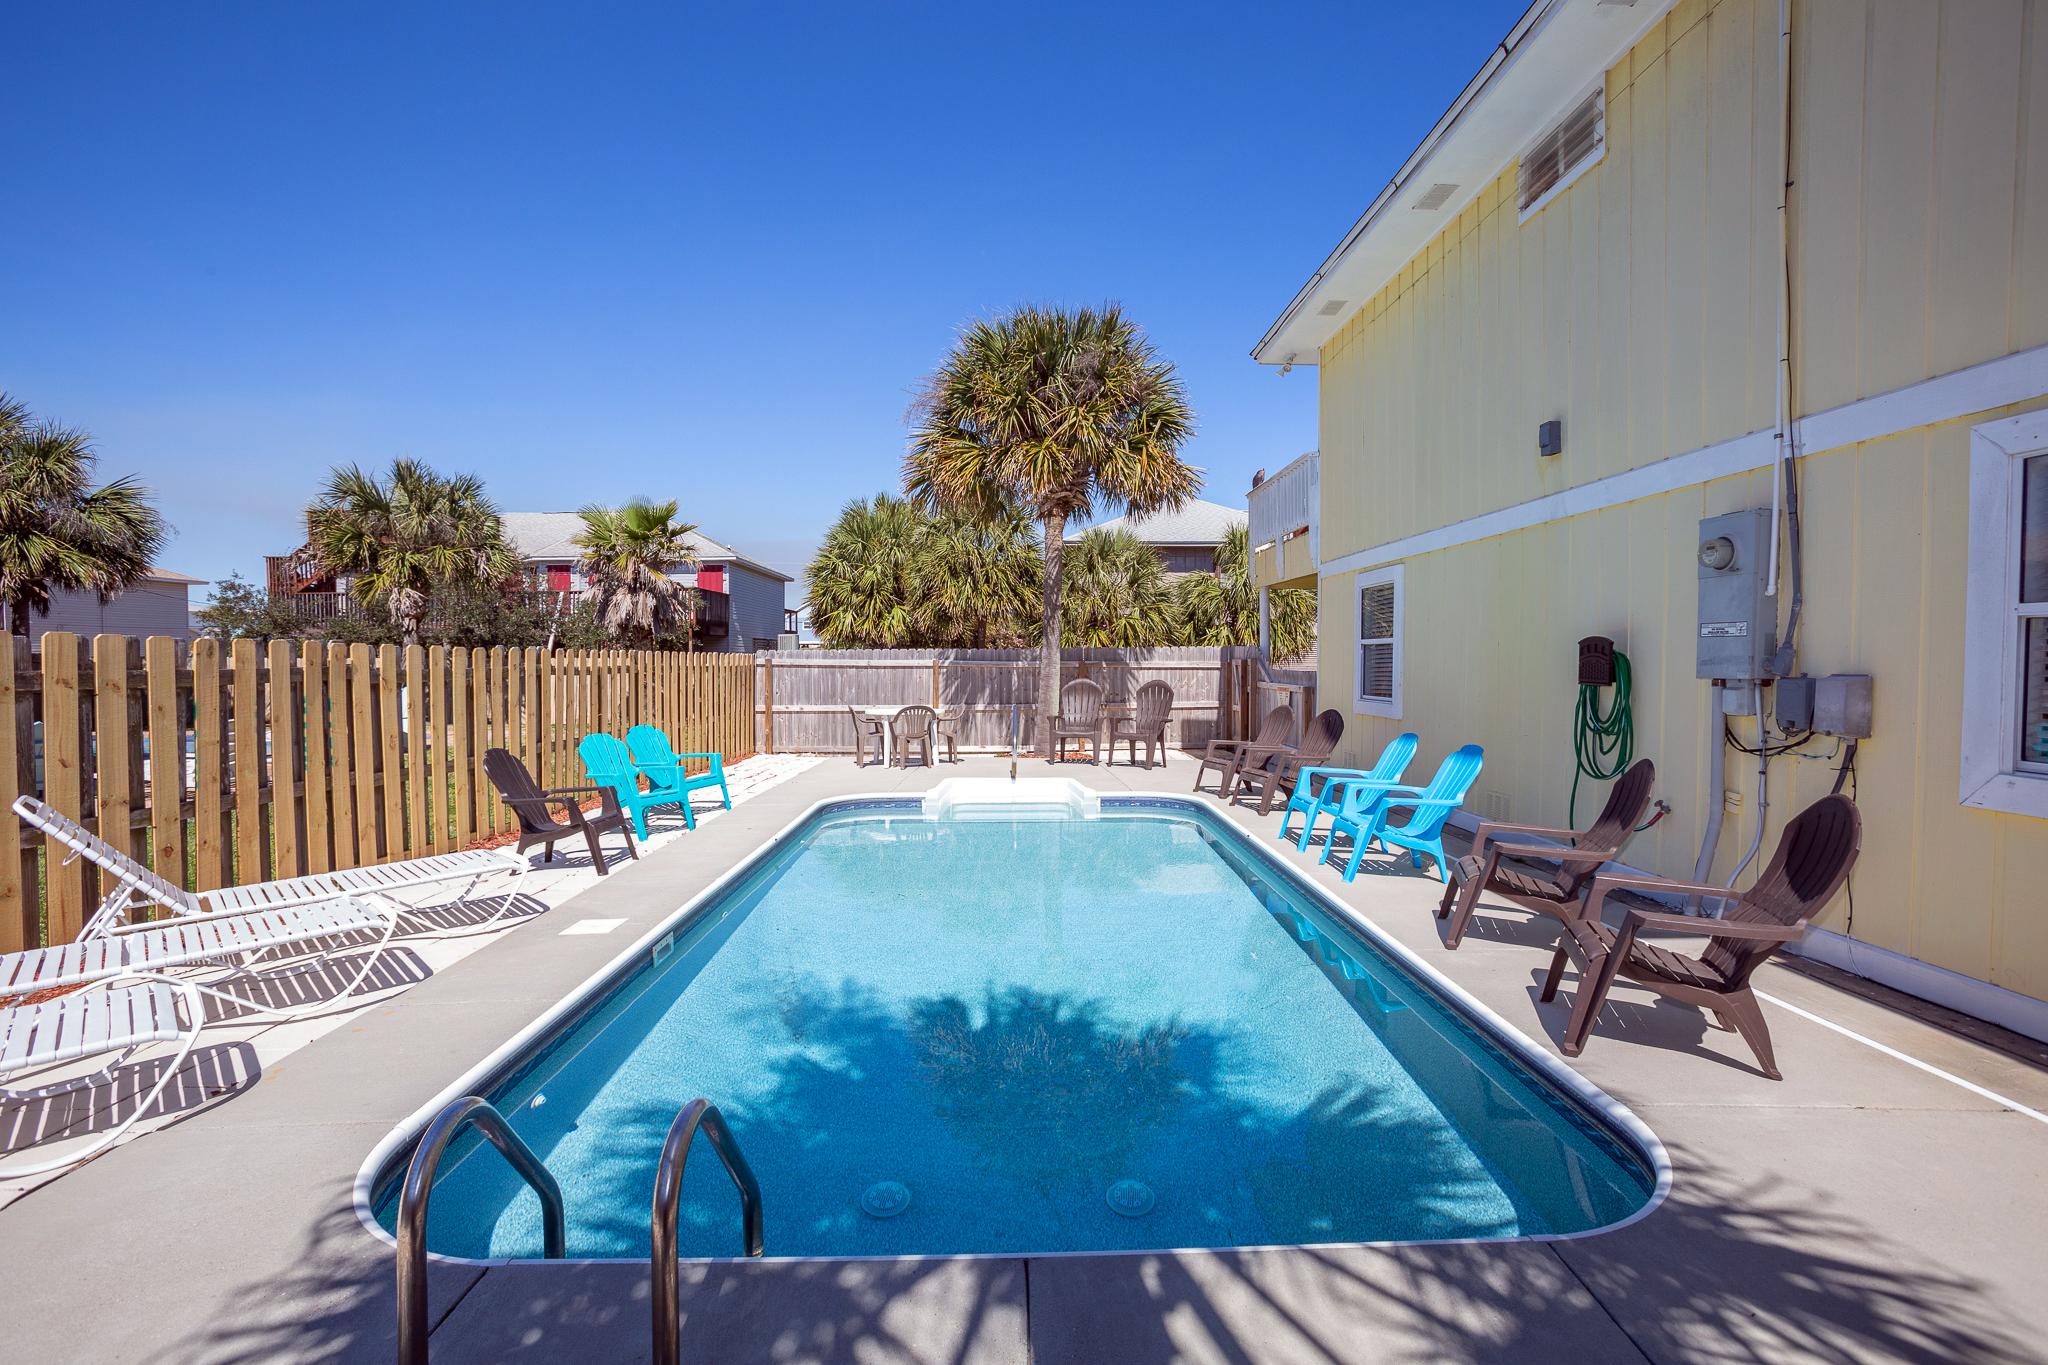 Maldonado 1015 - Sea the Big Picture House/Cottage rental in Pensacola Beach House Rentals in Pensacola Beach Florida - #41